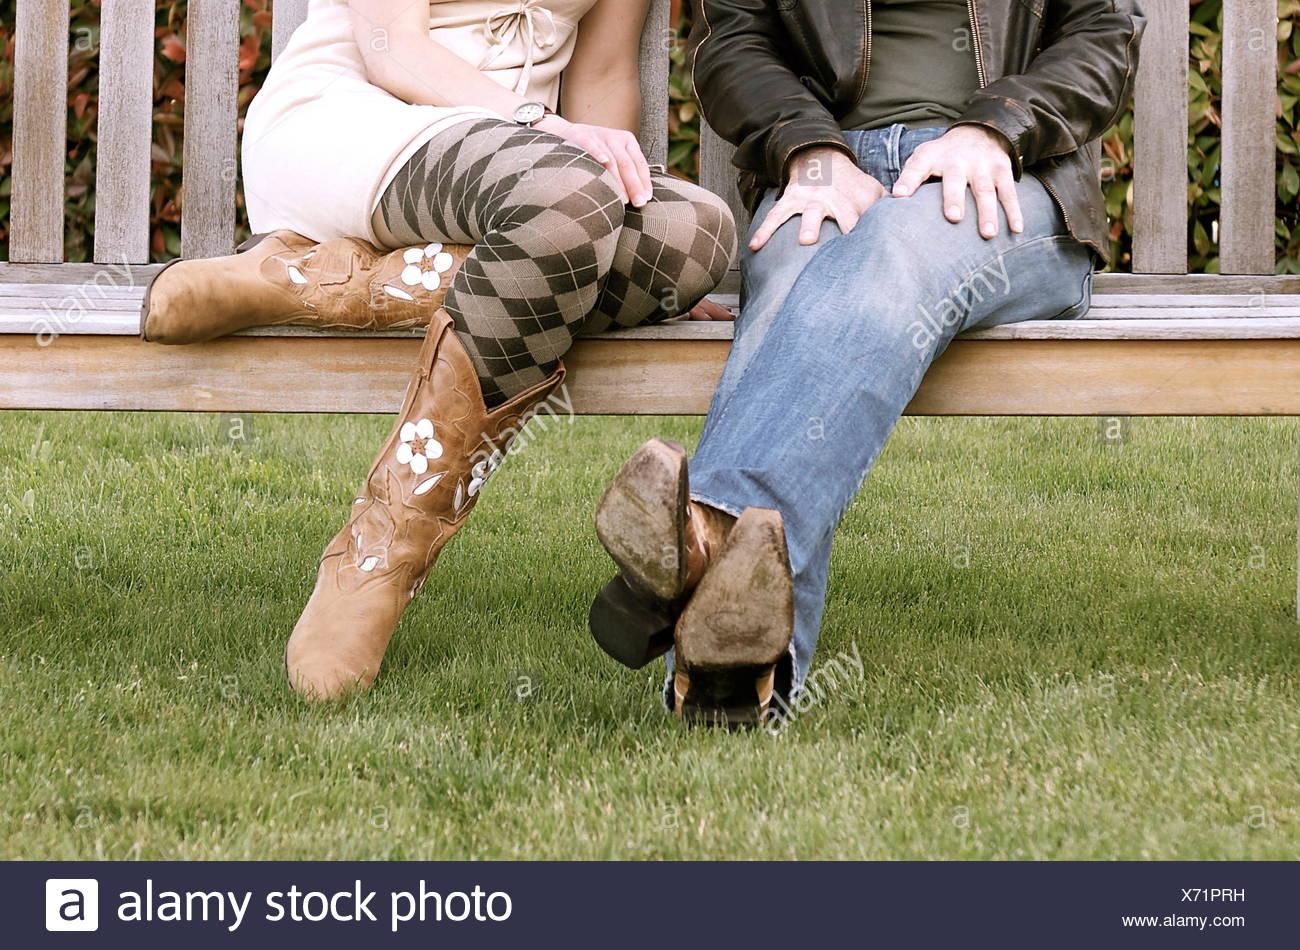 Sezione bassa di un paio di indossare stivali da cowboy di seduta su una panchina Immagini Stock